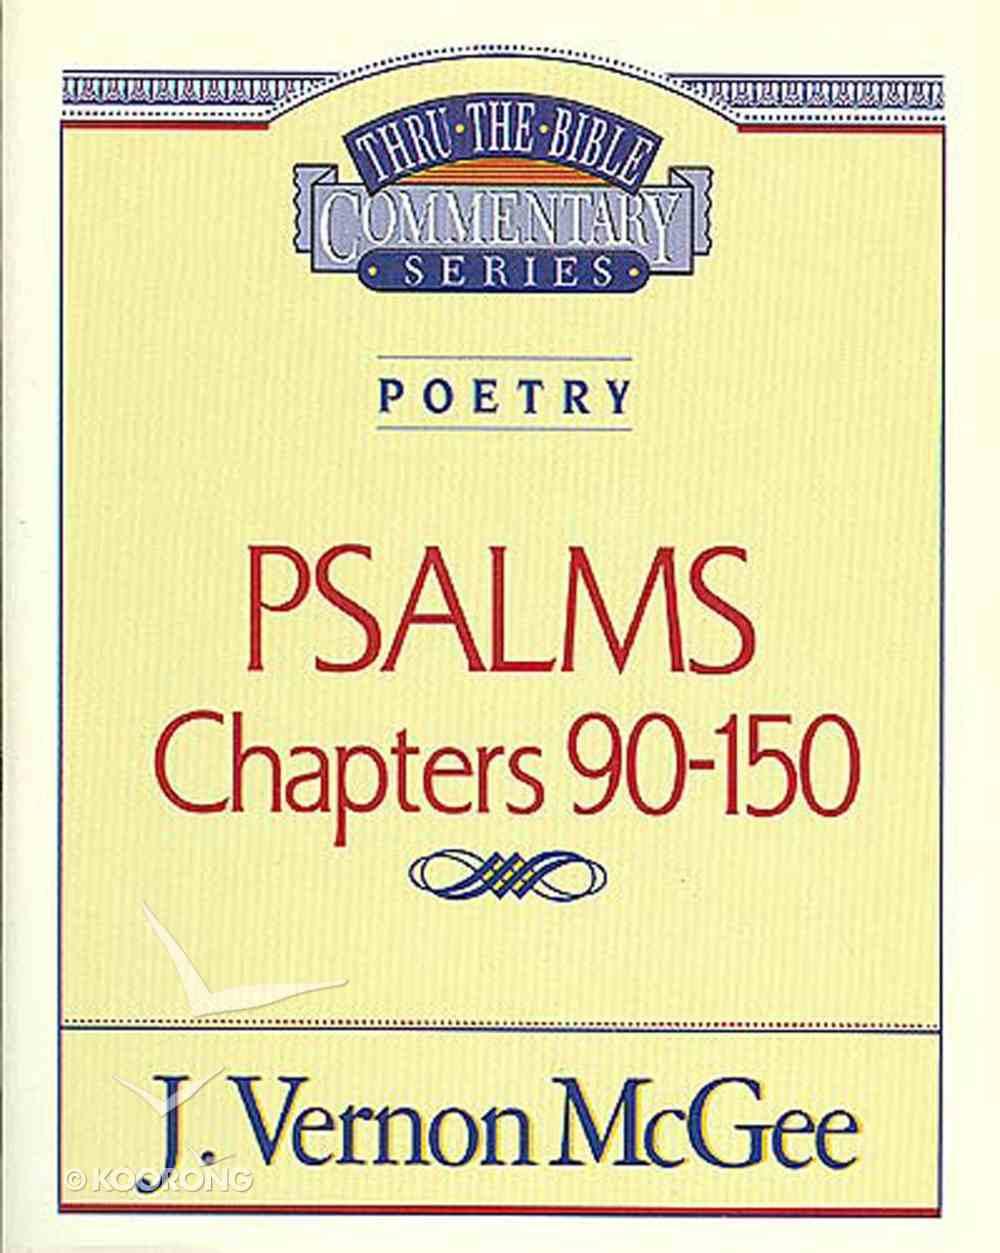 Thru the Bible OT #19: Psalms (Volume 3) (#19 in Thru The Bible Old Testament Series) eBook